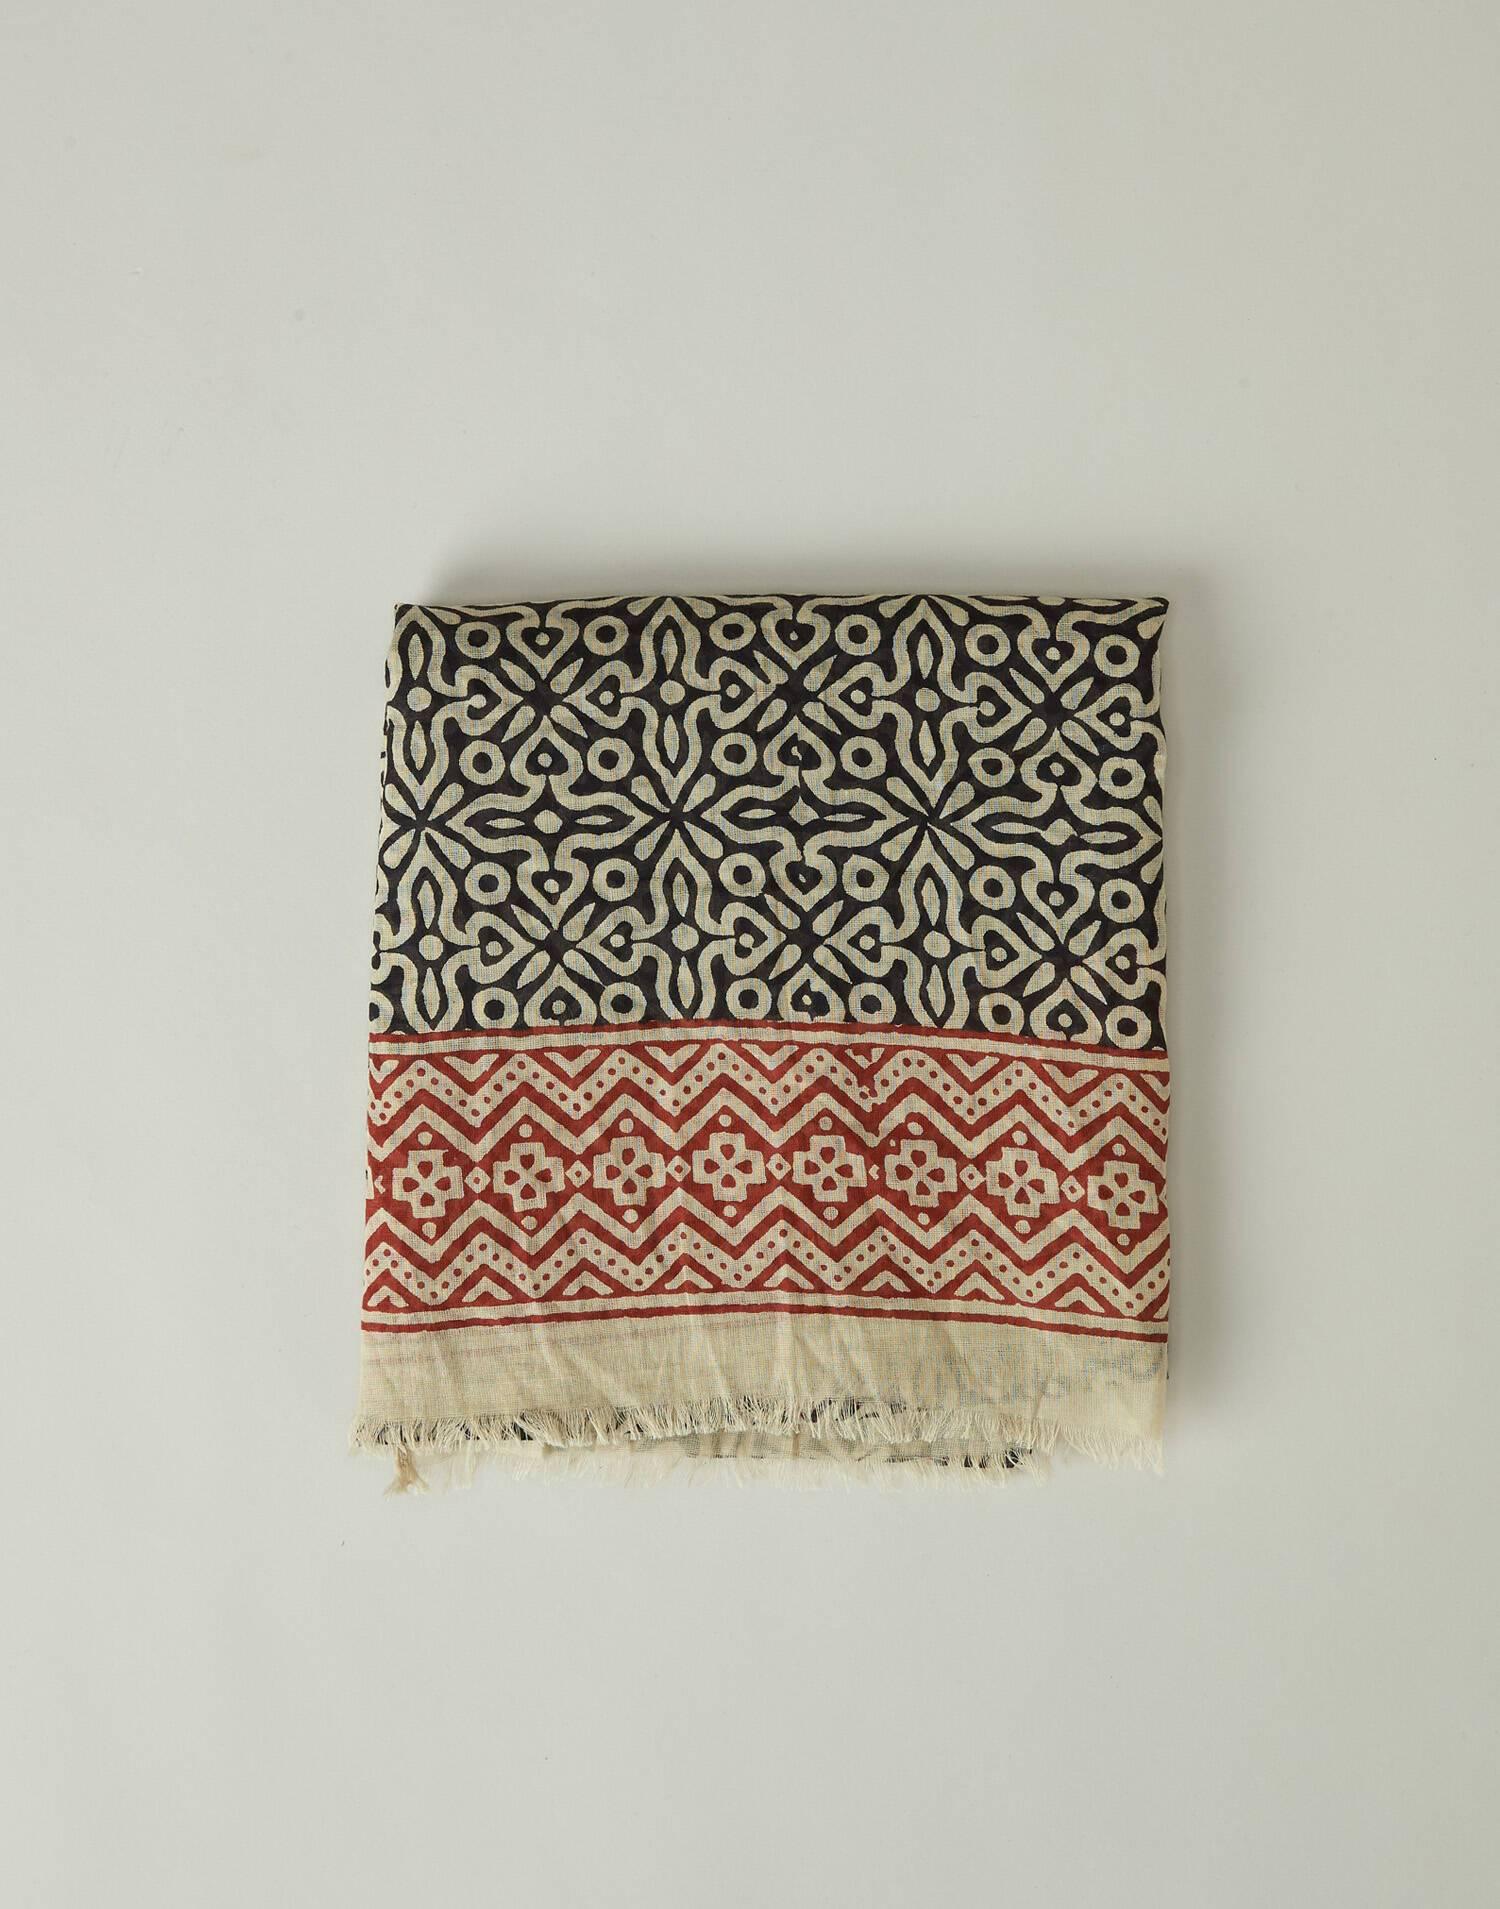 Abstract printed foulard